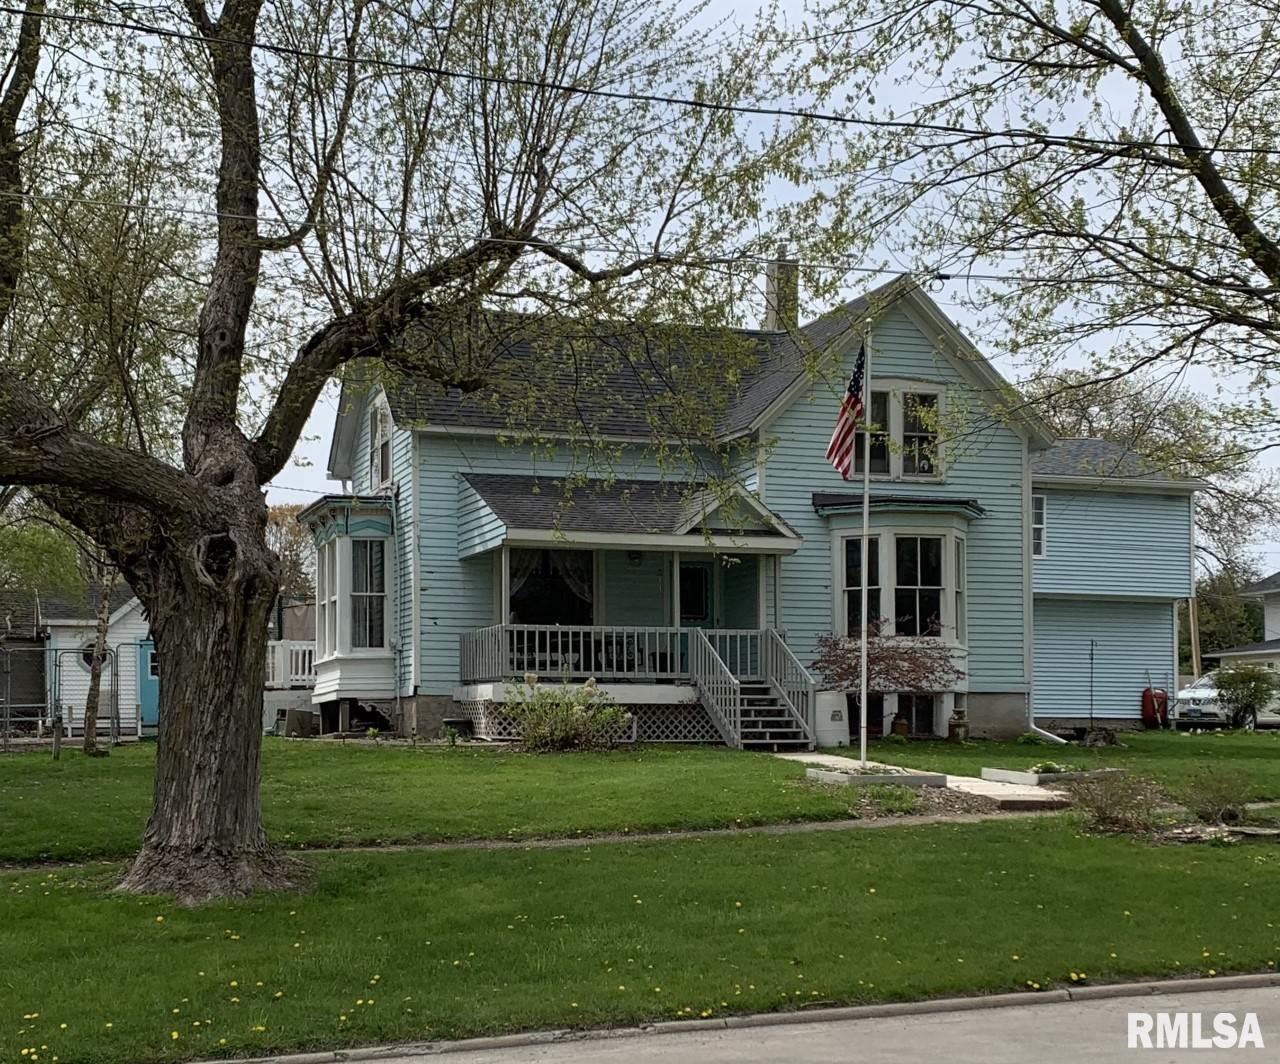 416 N CENTER Property Photo - Galva, IL real estate listing